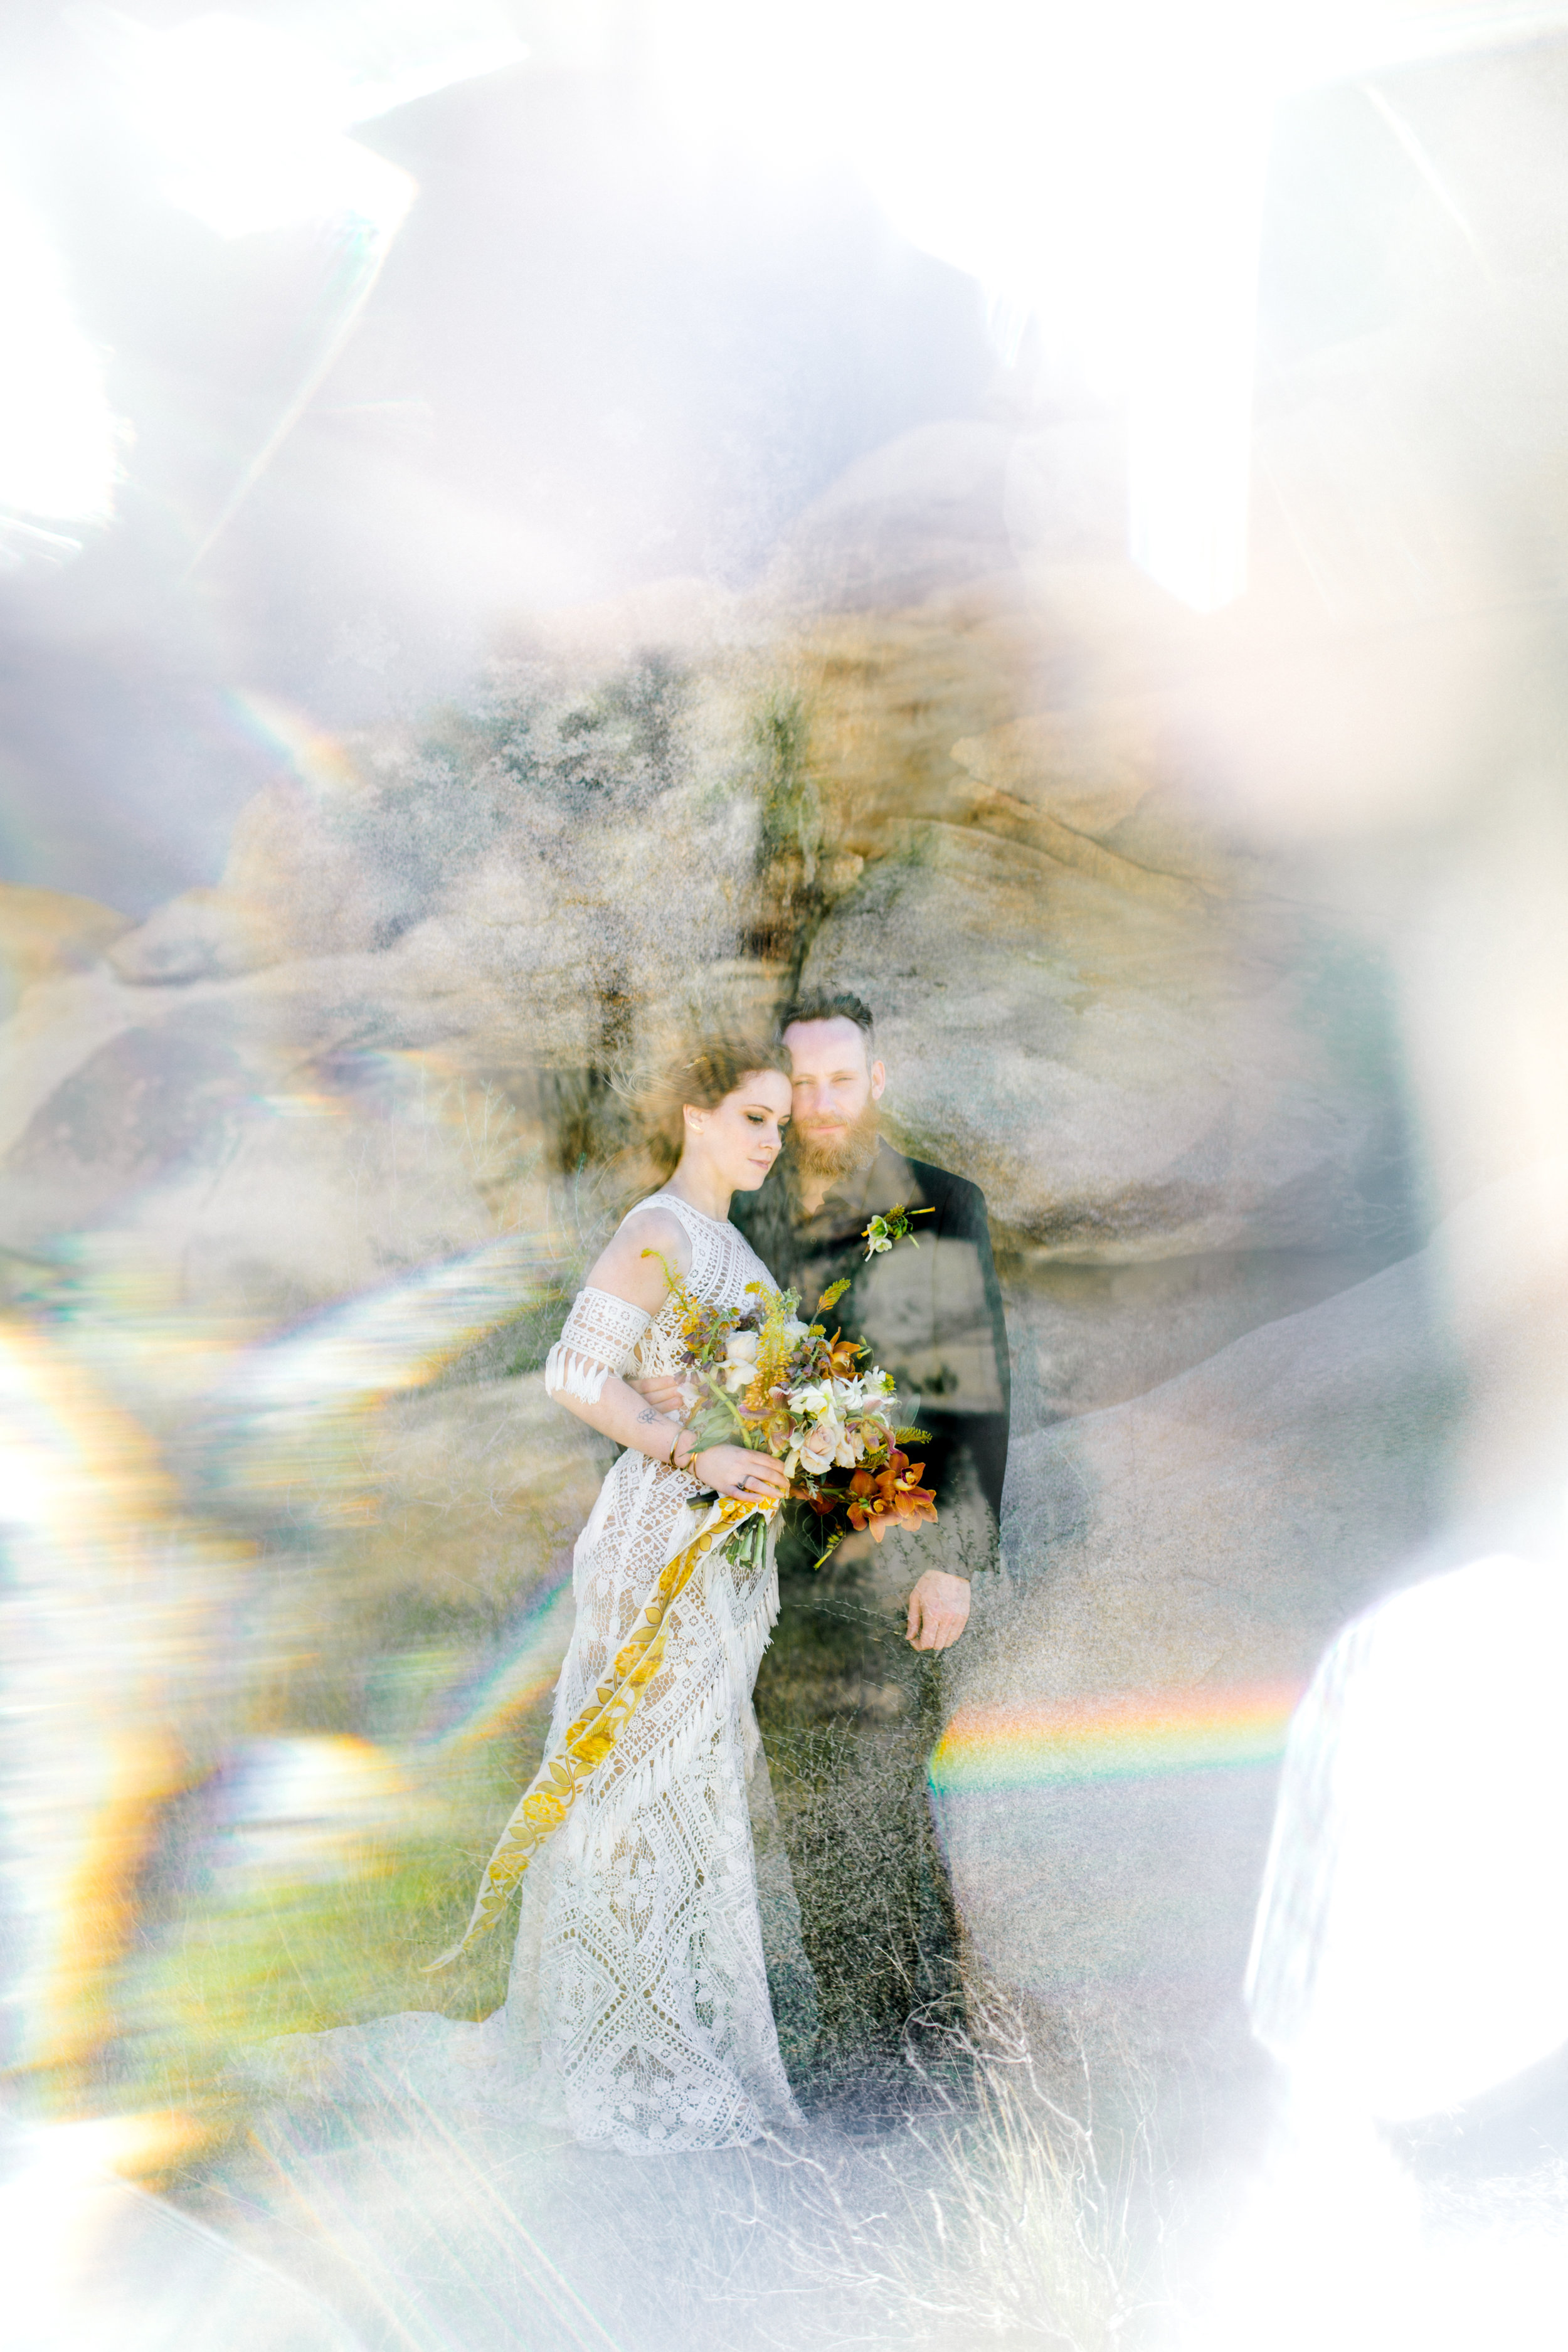 jessica sgubin photography atlanta portrait photographer engagement family couple wedding joshua tree wedding elopement-1-13.jpg